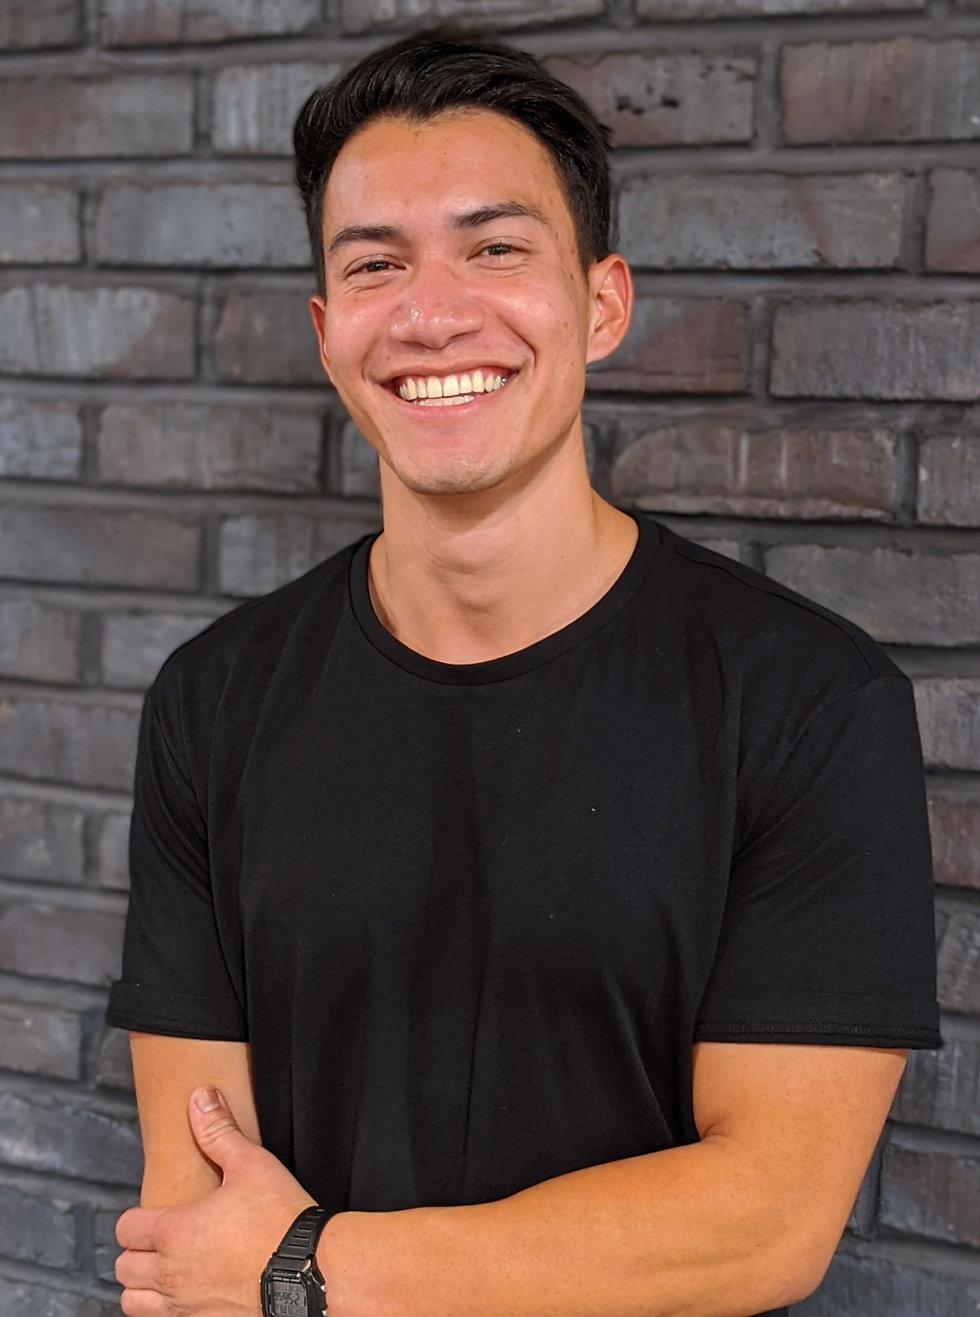 Jake Acuna